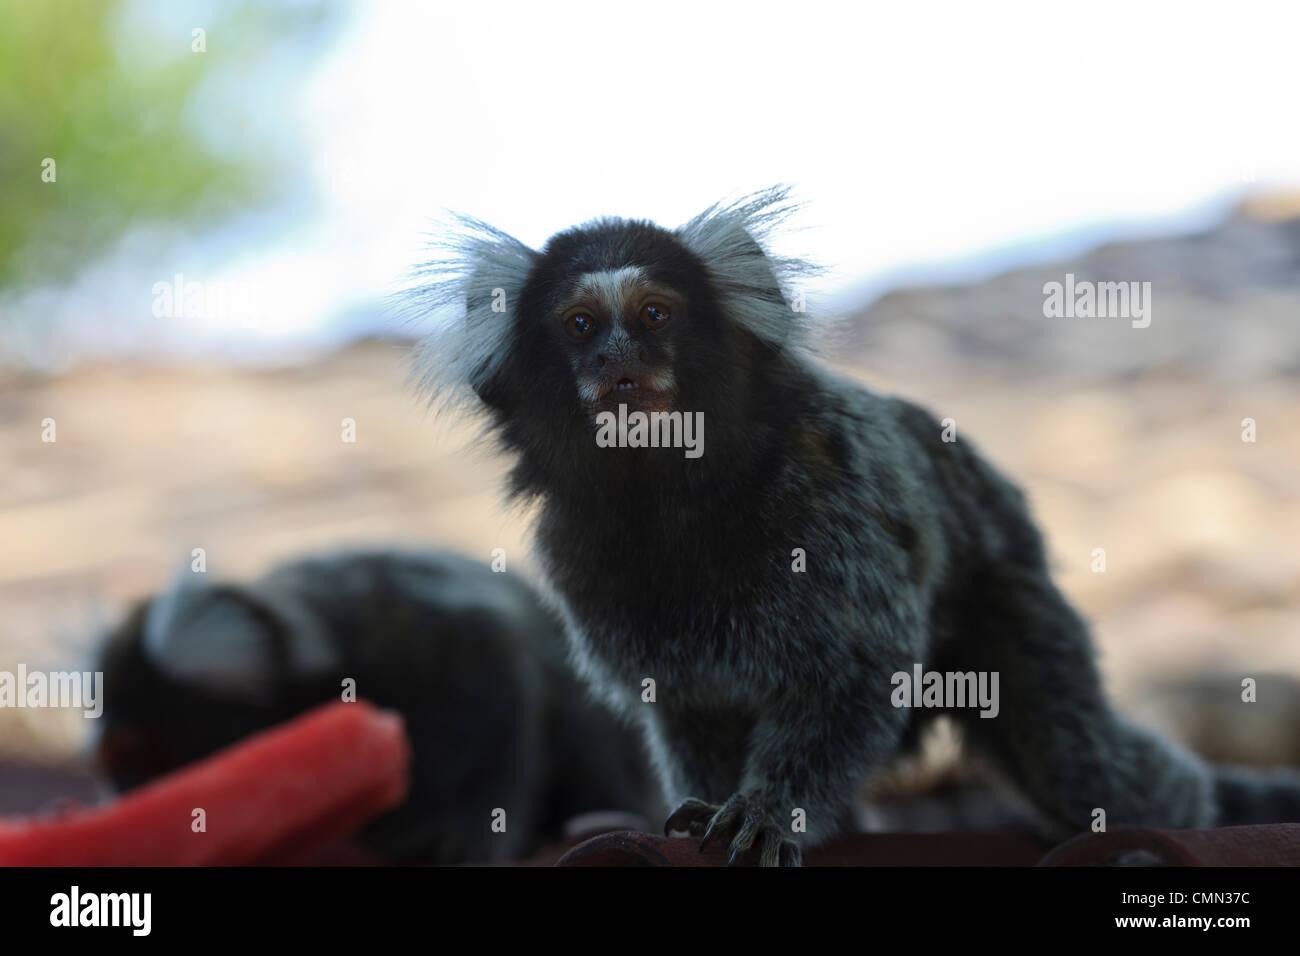 Tree monkey, Soinin, Callitrix jaccus, Marmoset, Tibau do Sul, Rio Grande do Norte, Brazil, Brasil - Stock Image